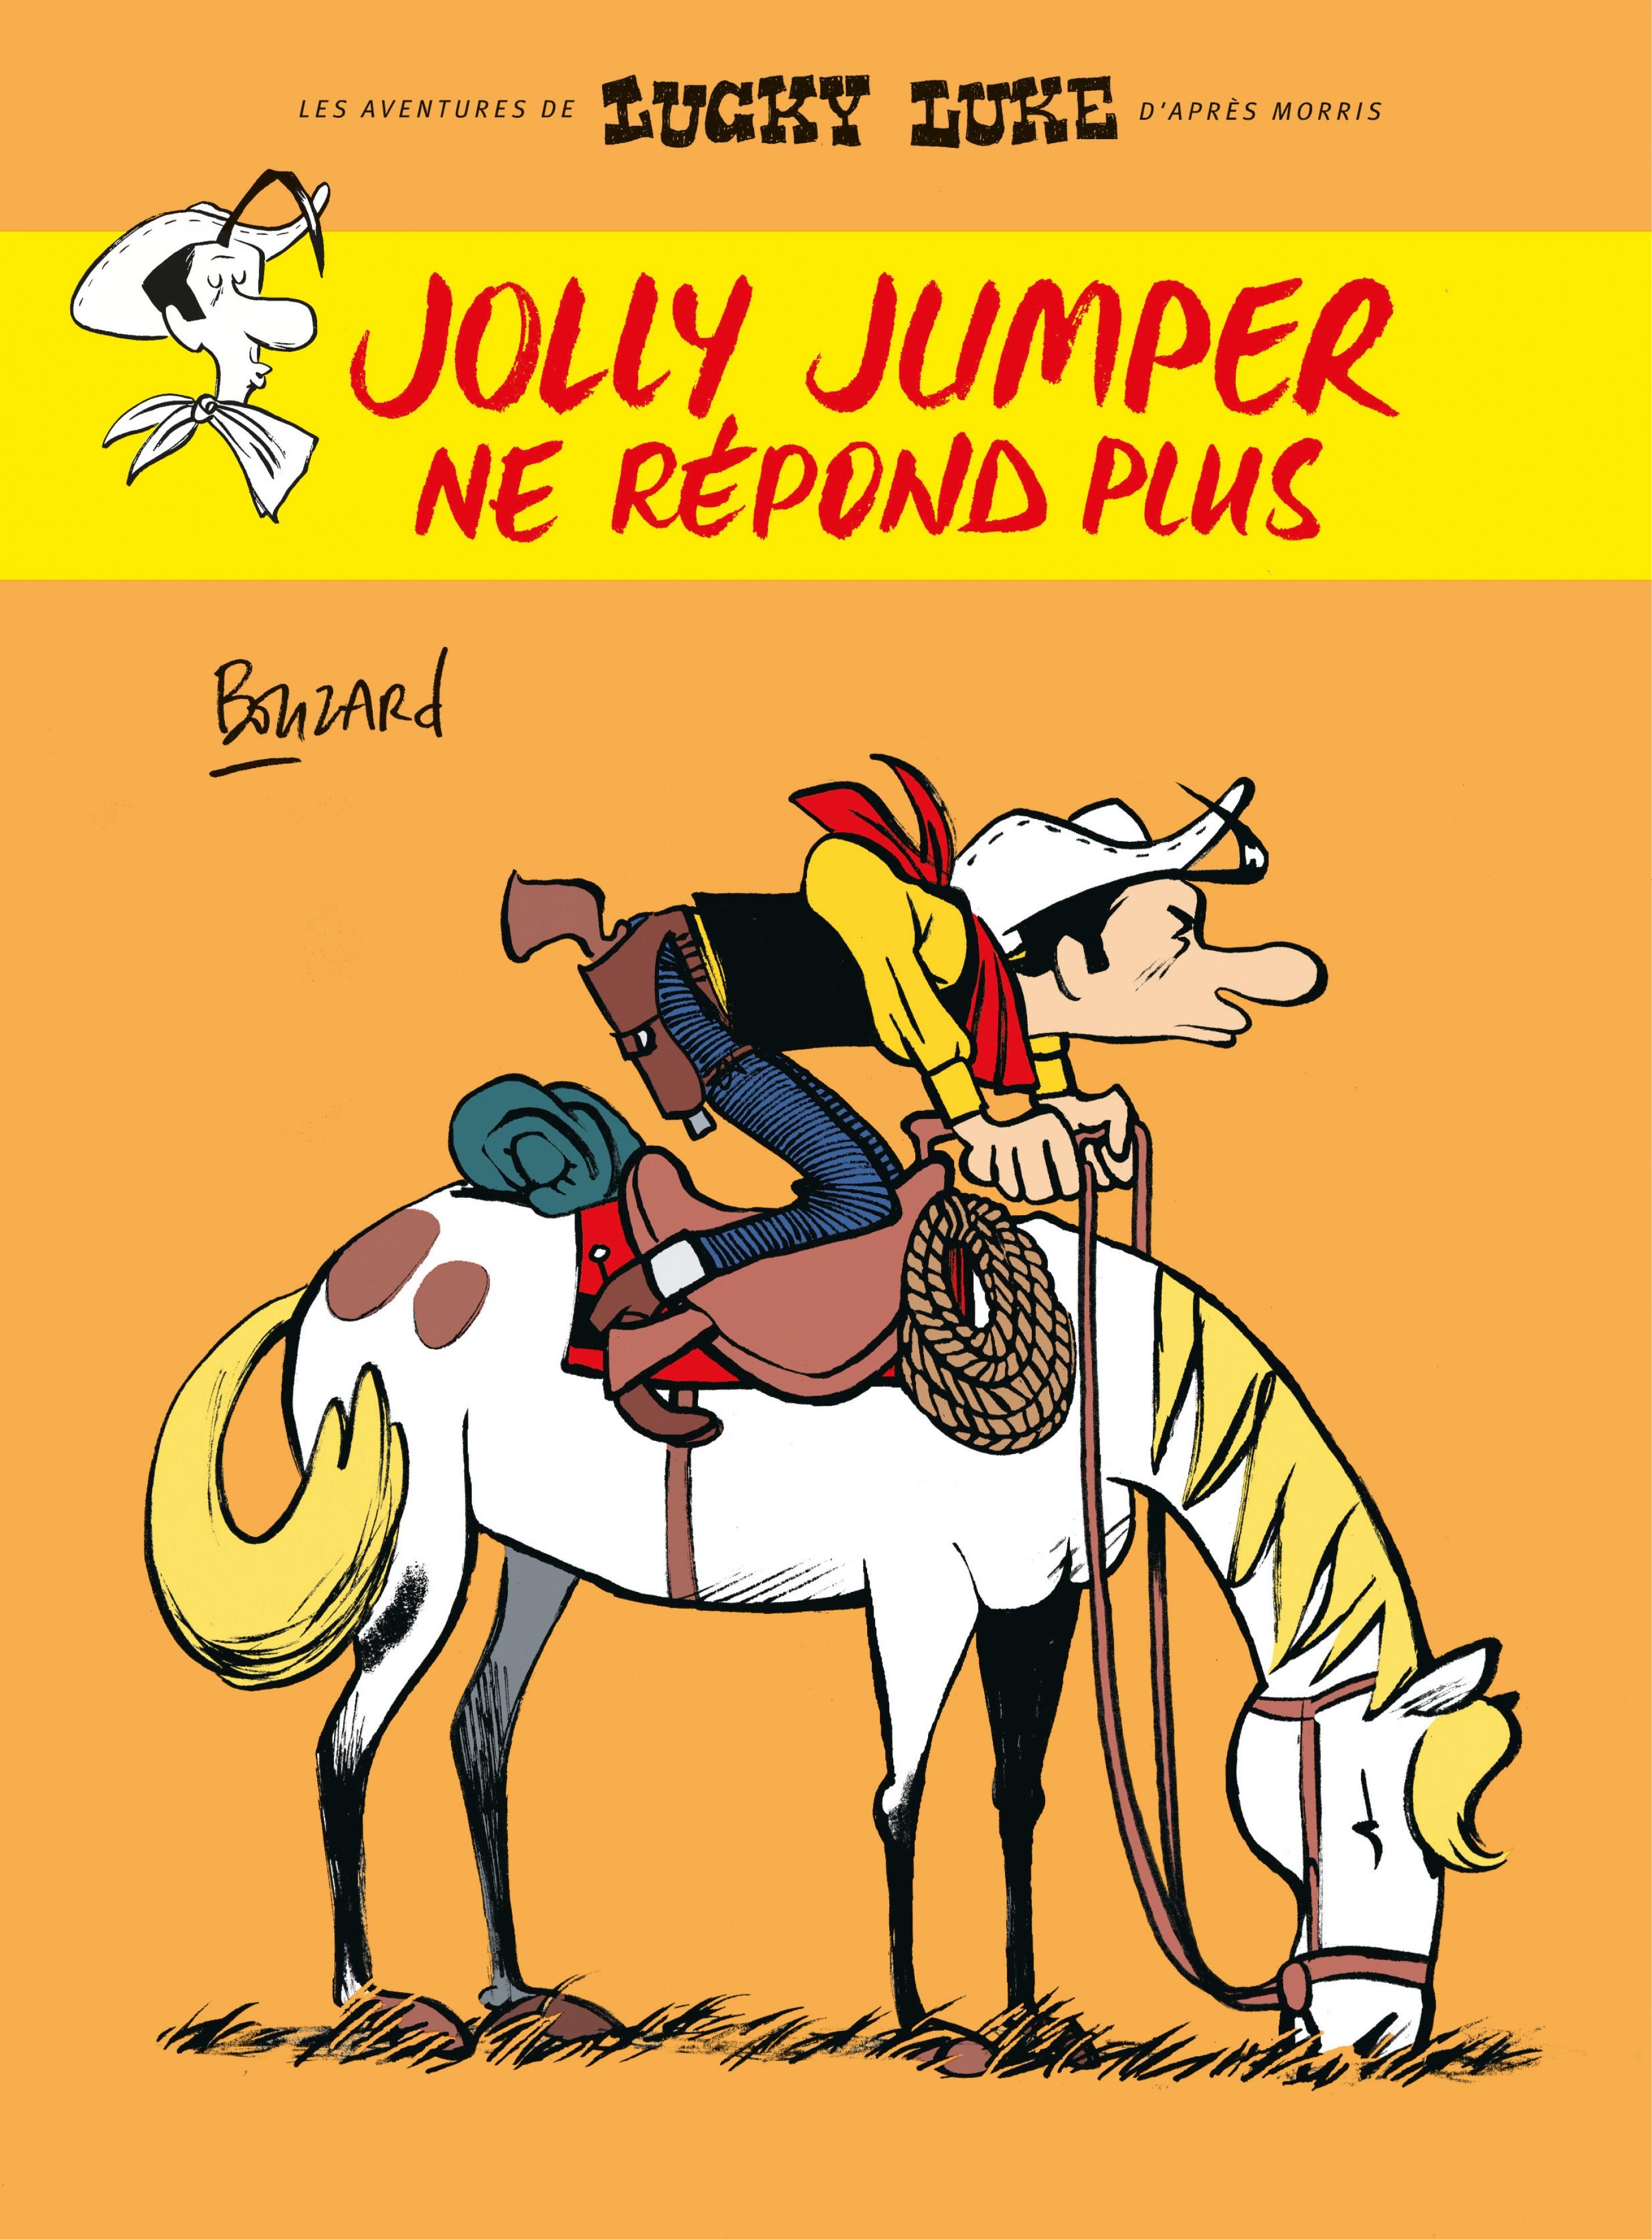 Les aventures de Lucky Luke d'après Morris. Jolly Jumper ne...